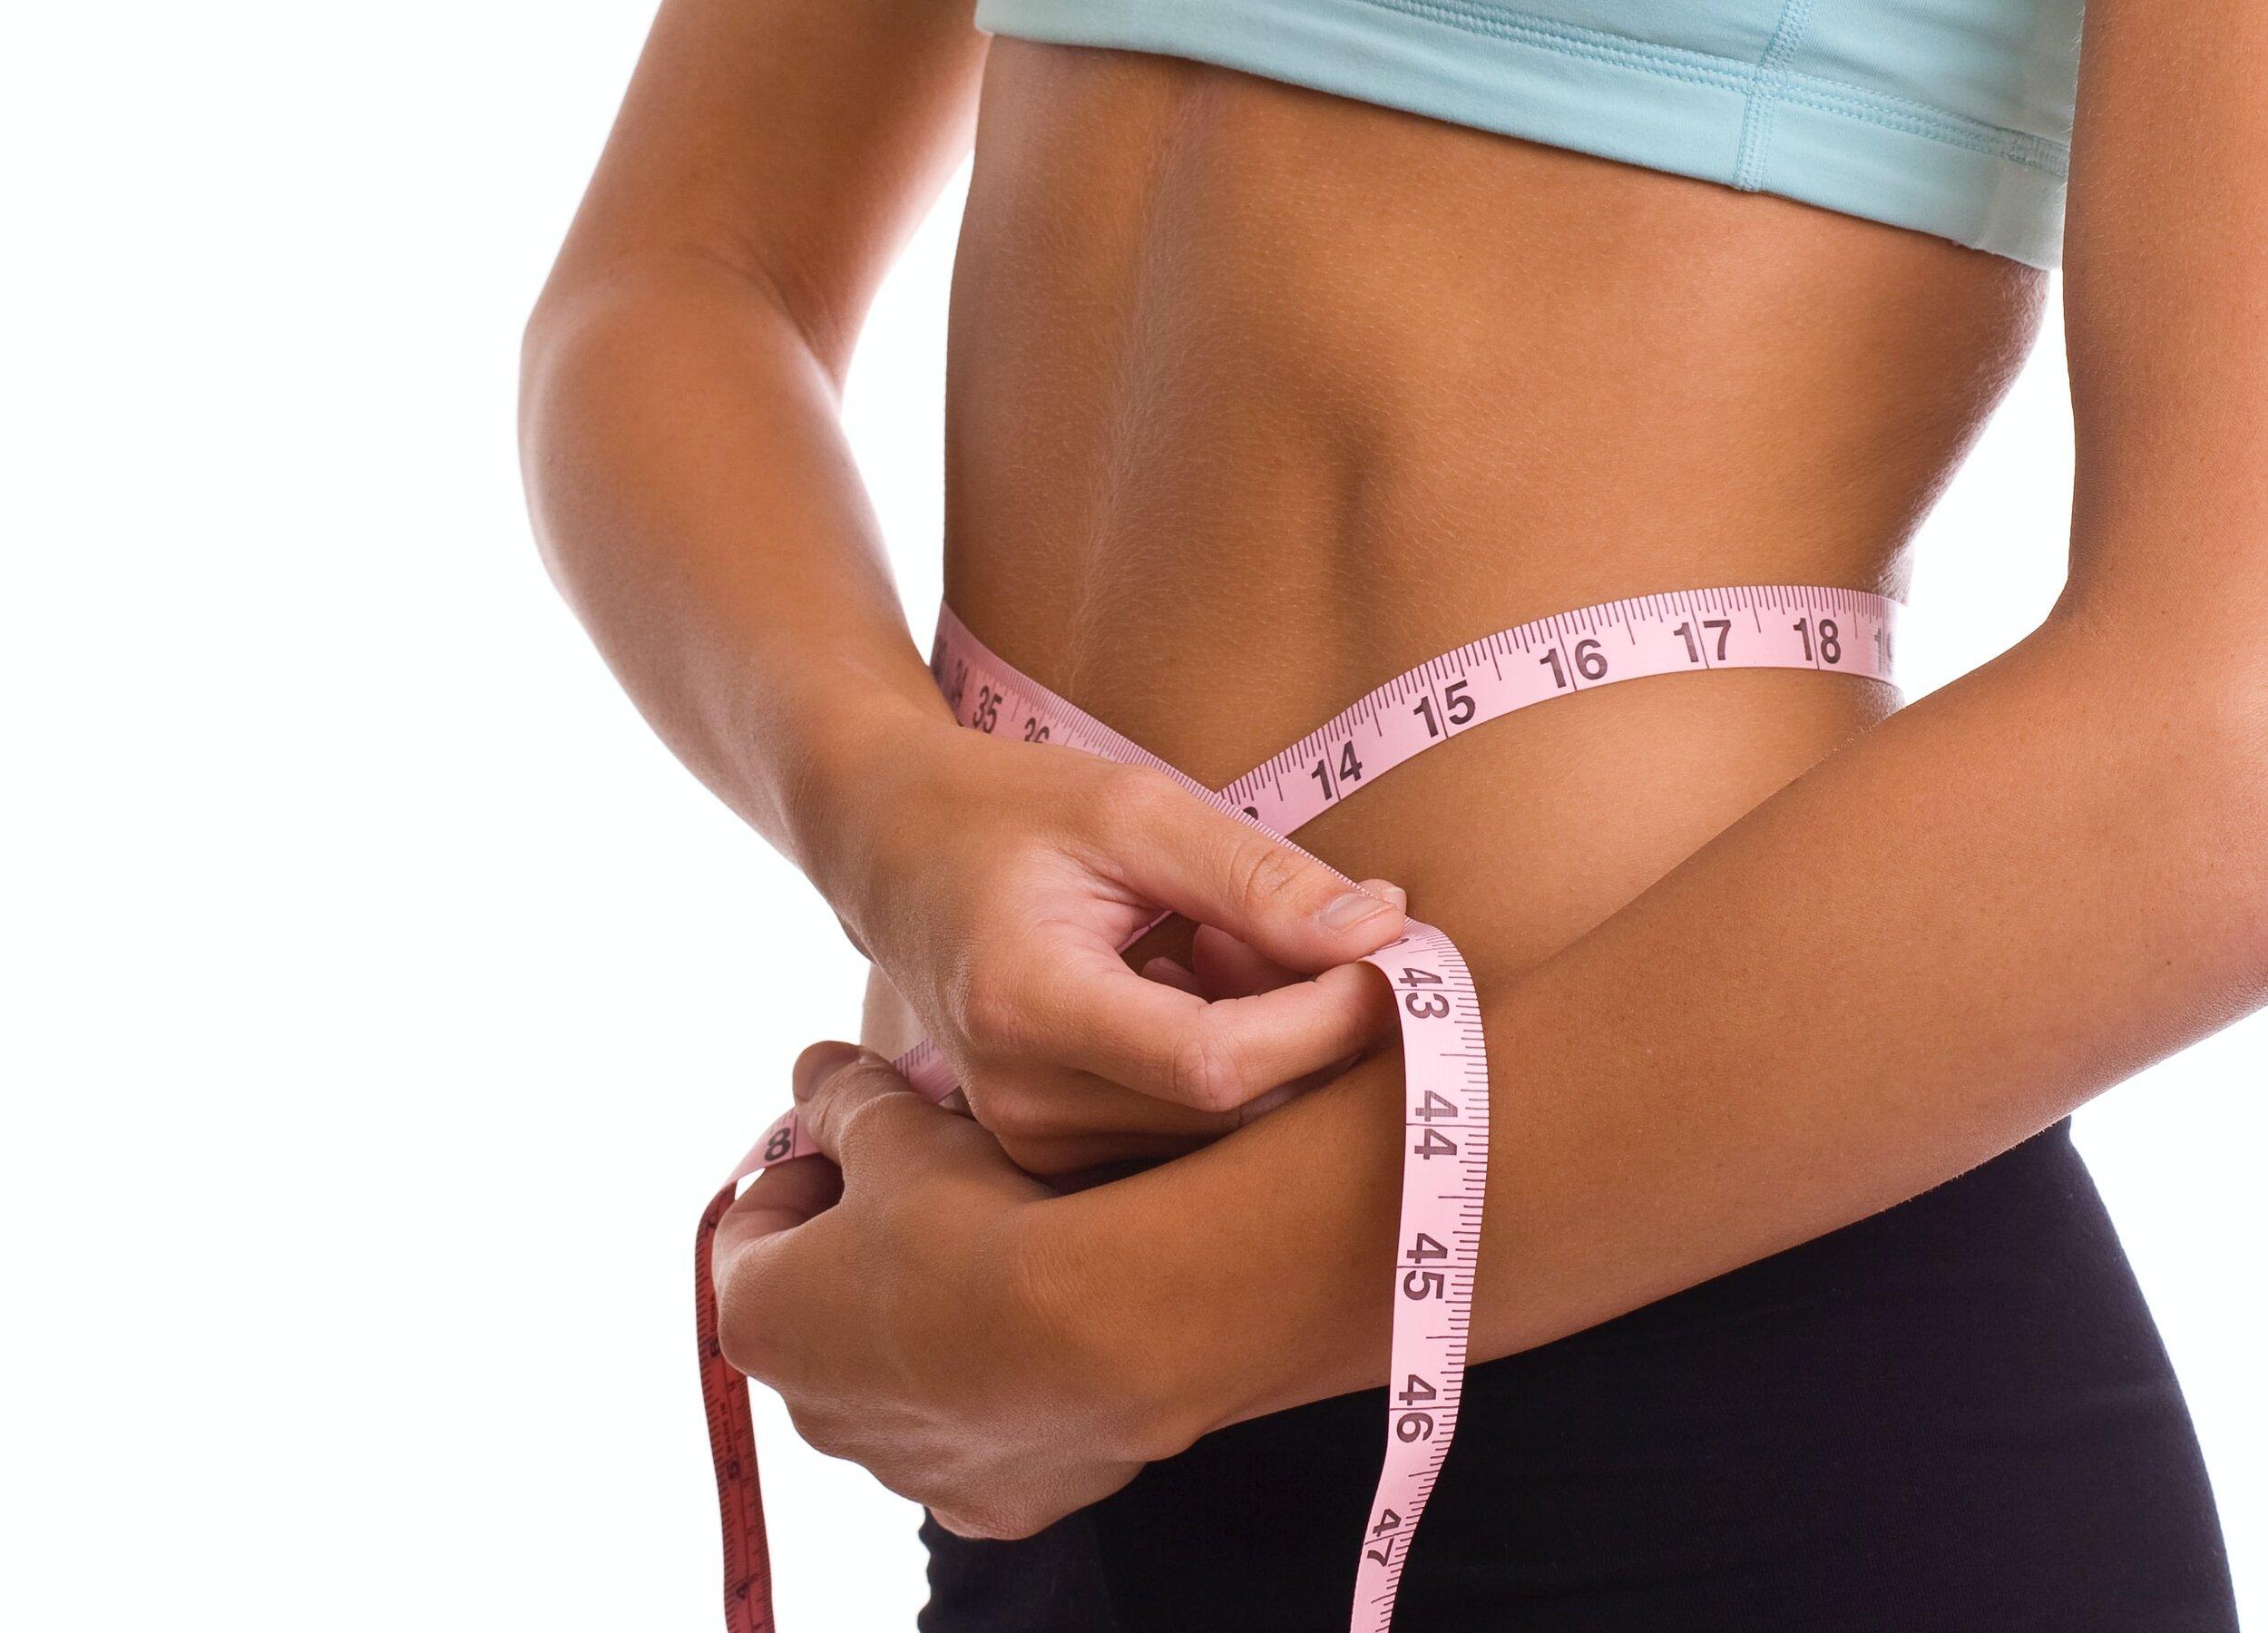 lowering body fat percentage fitness diet